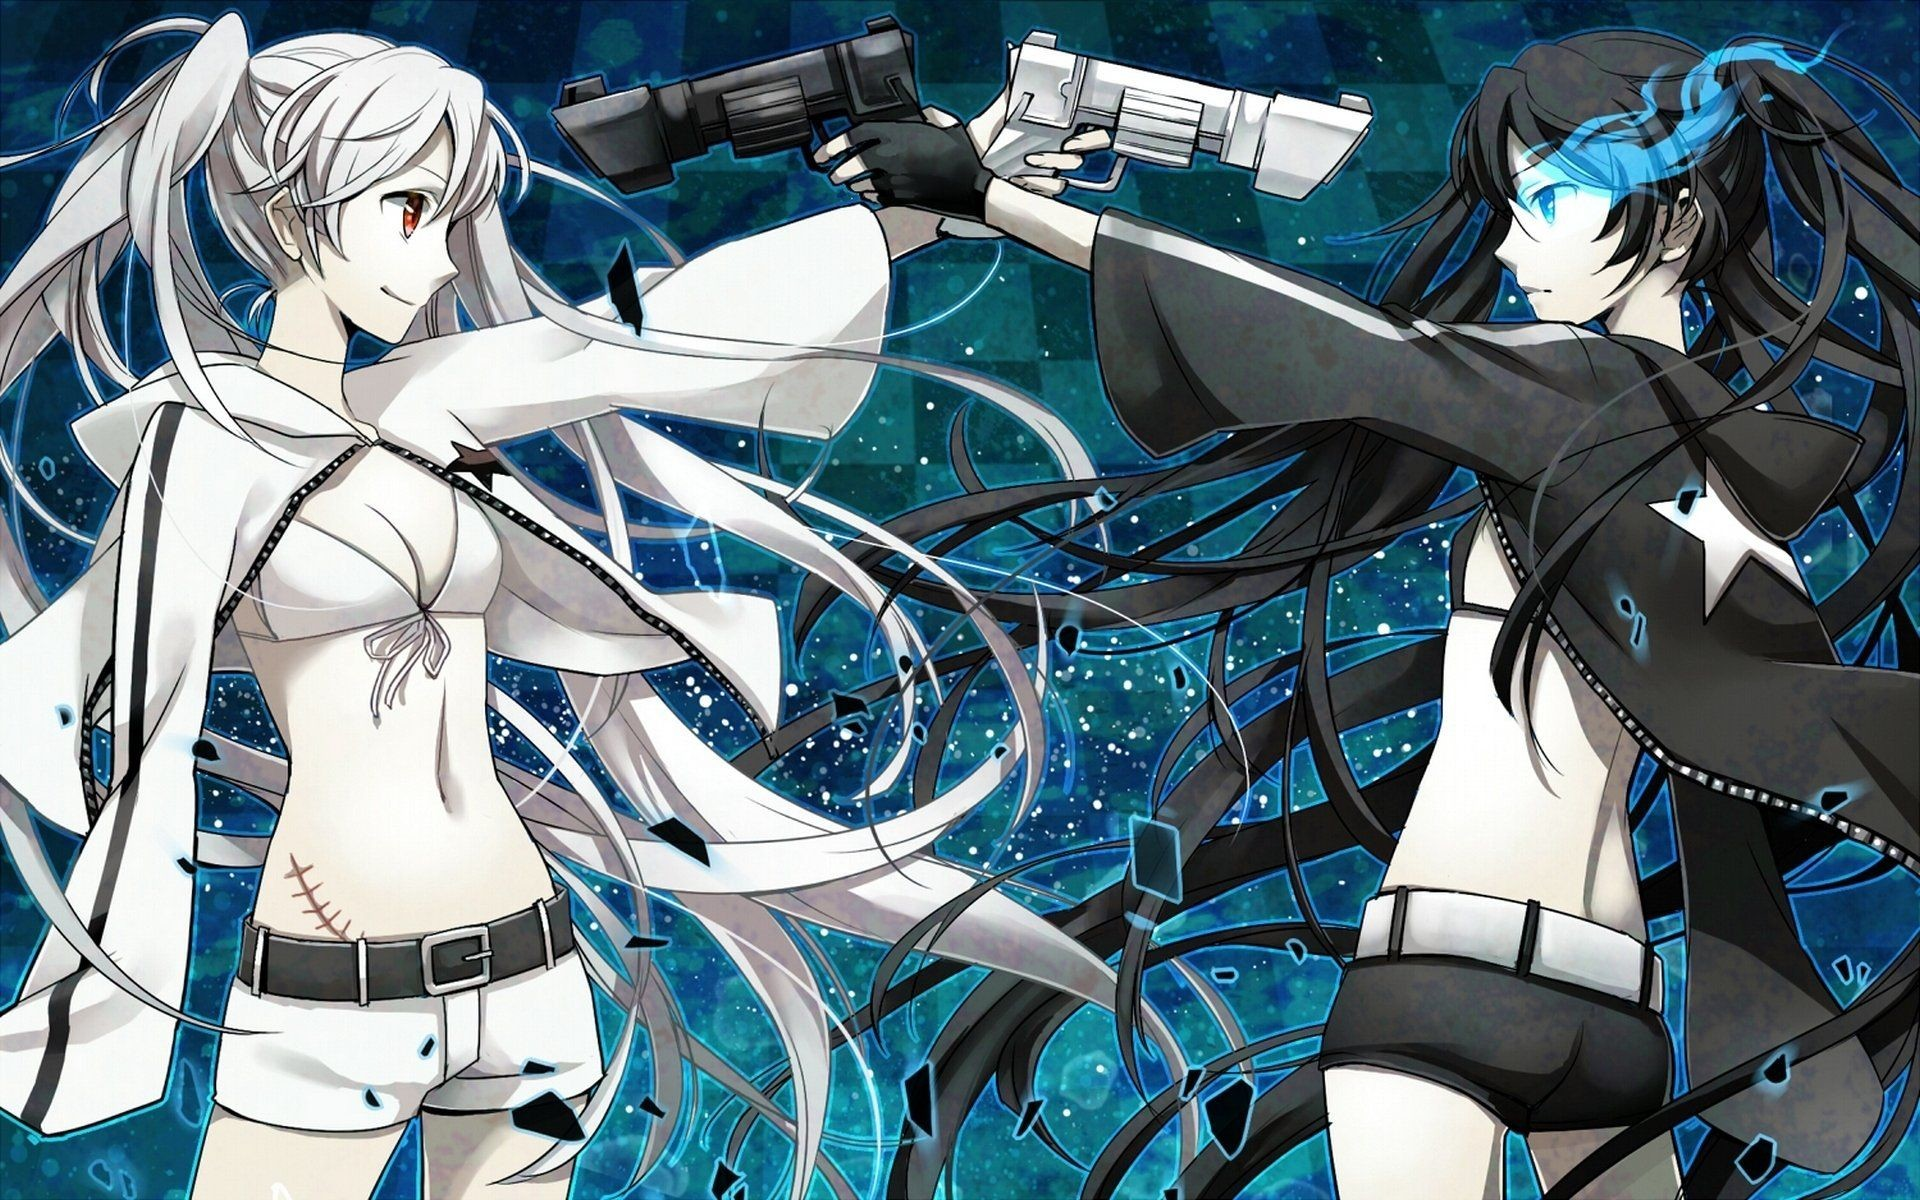 … Anime Desktop Wallpaper Image Images Wallpapers. Download